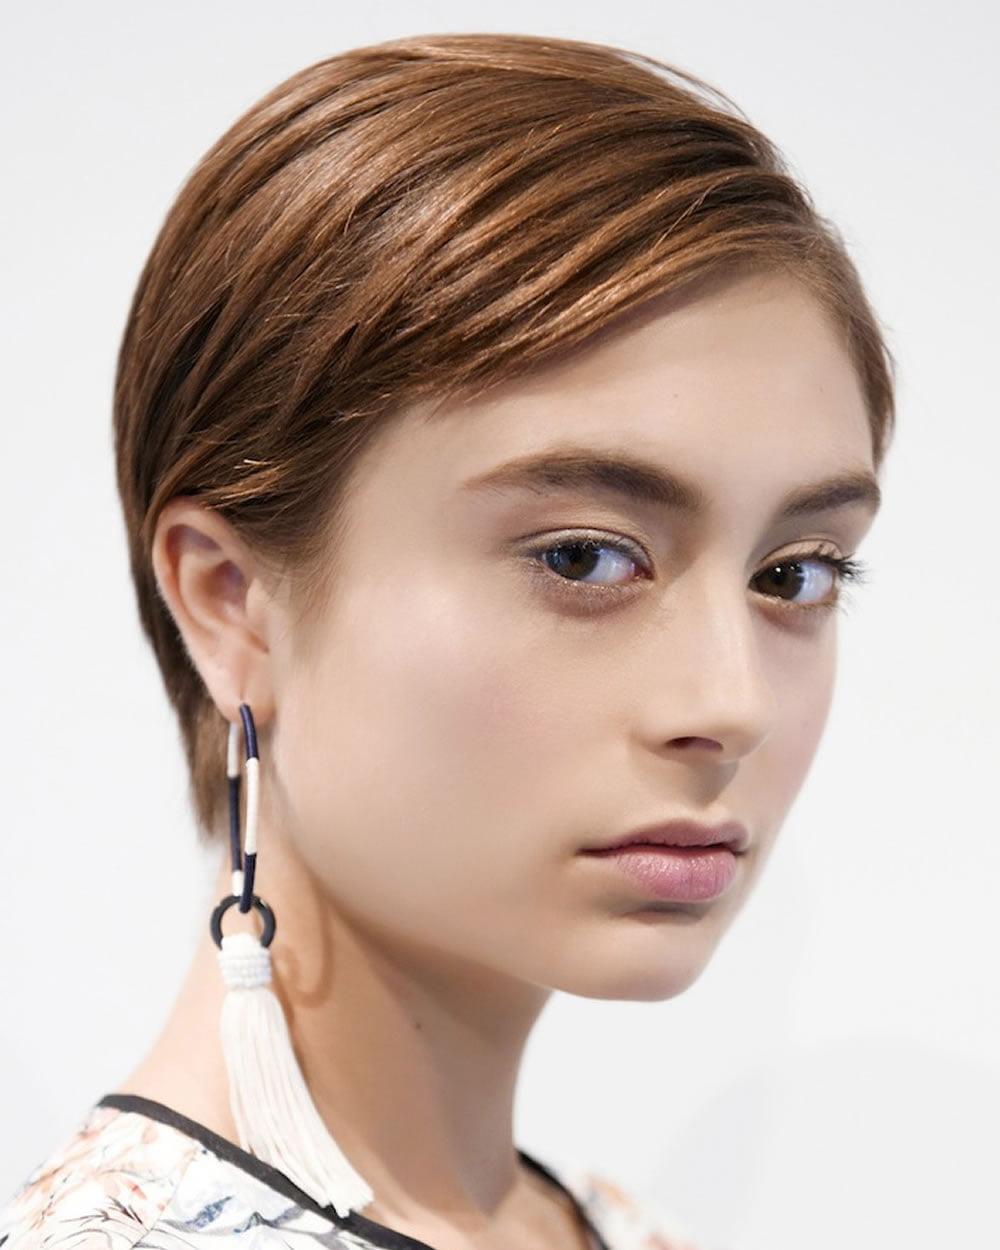 Layered hairstyles 2019